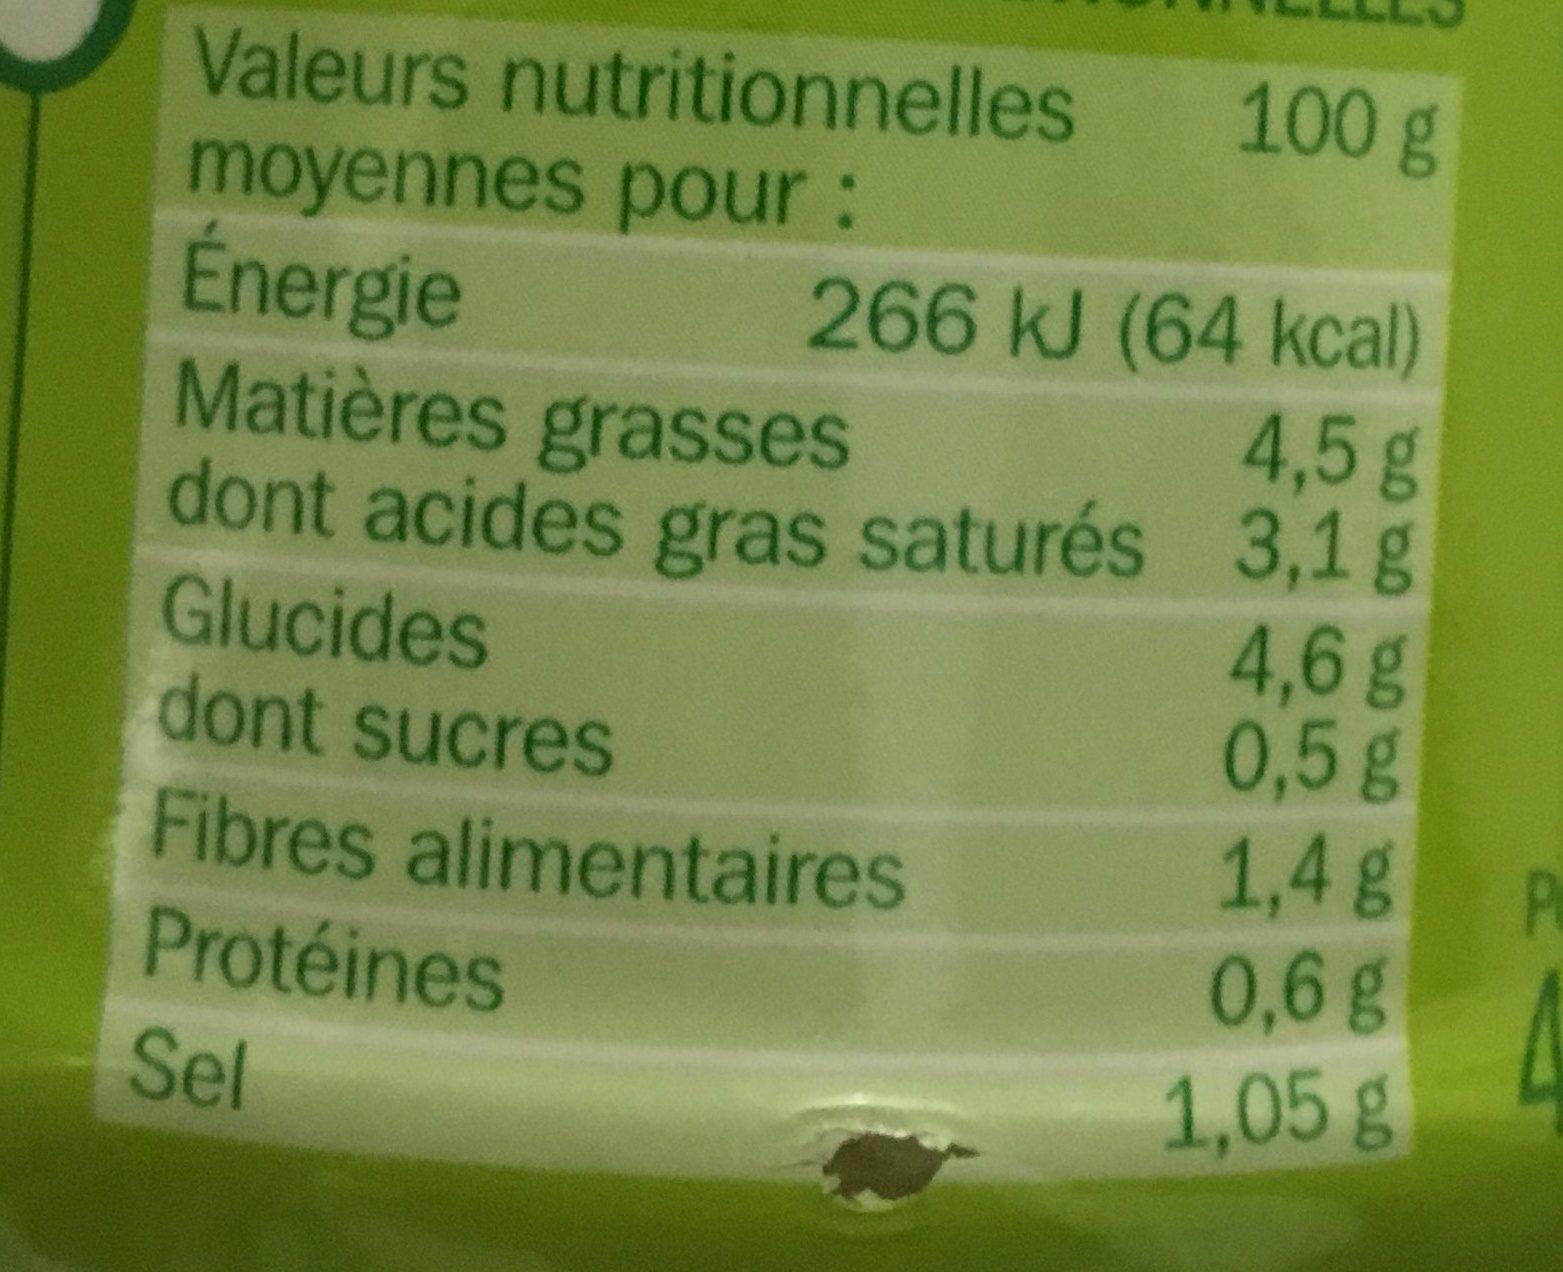 Sauce risotto champignons - Informations nutritionnelles - fr